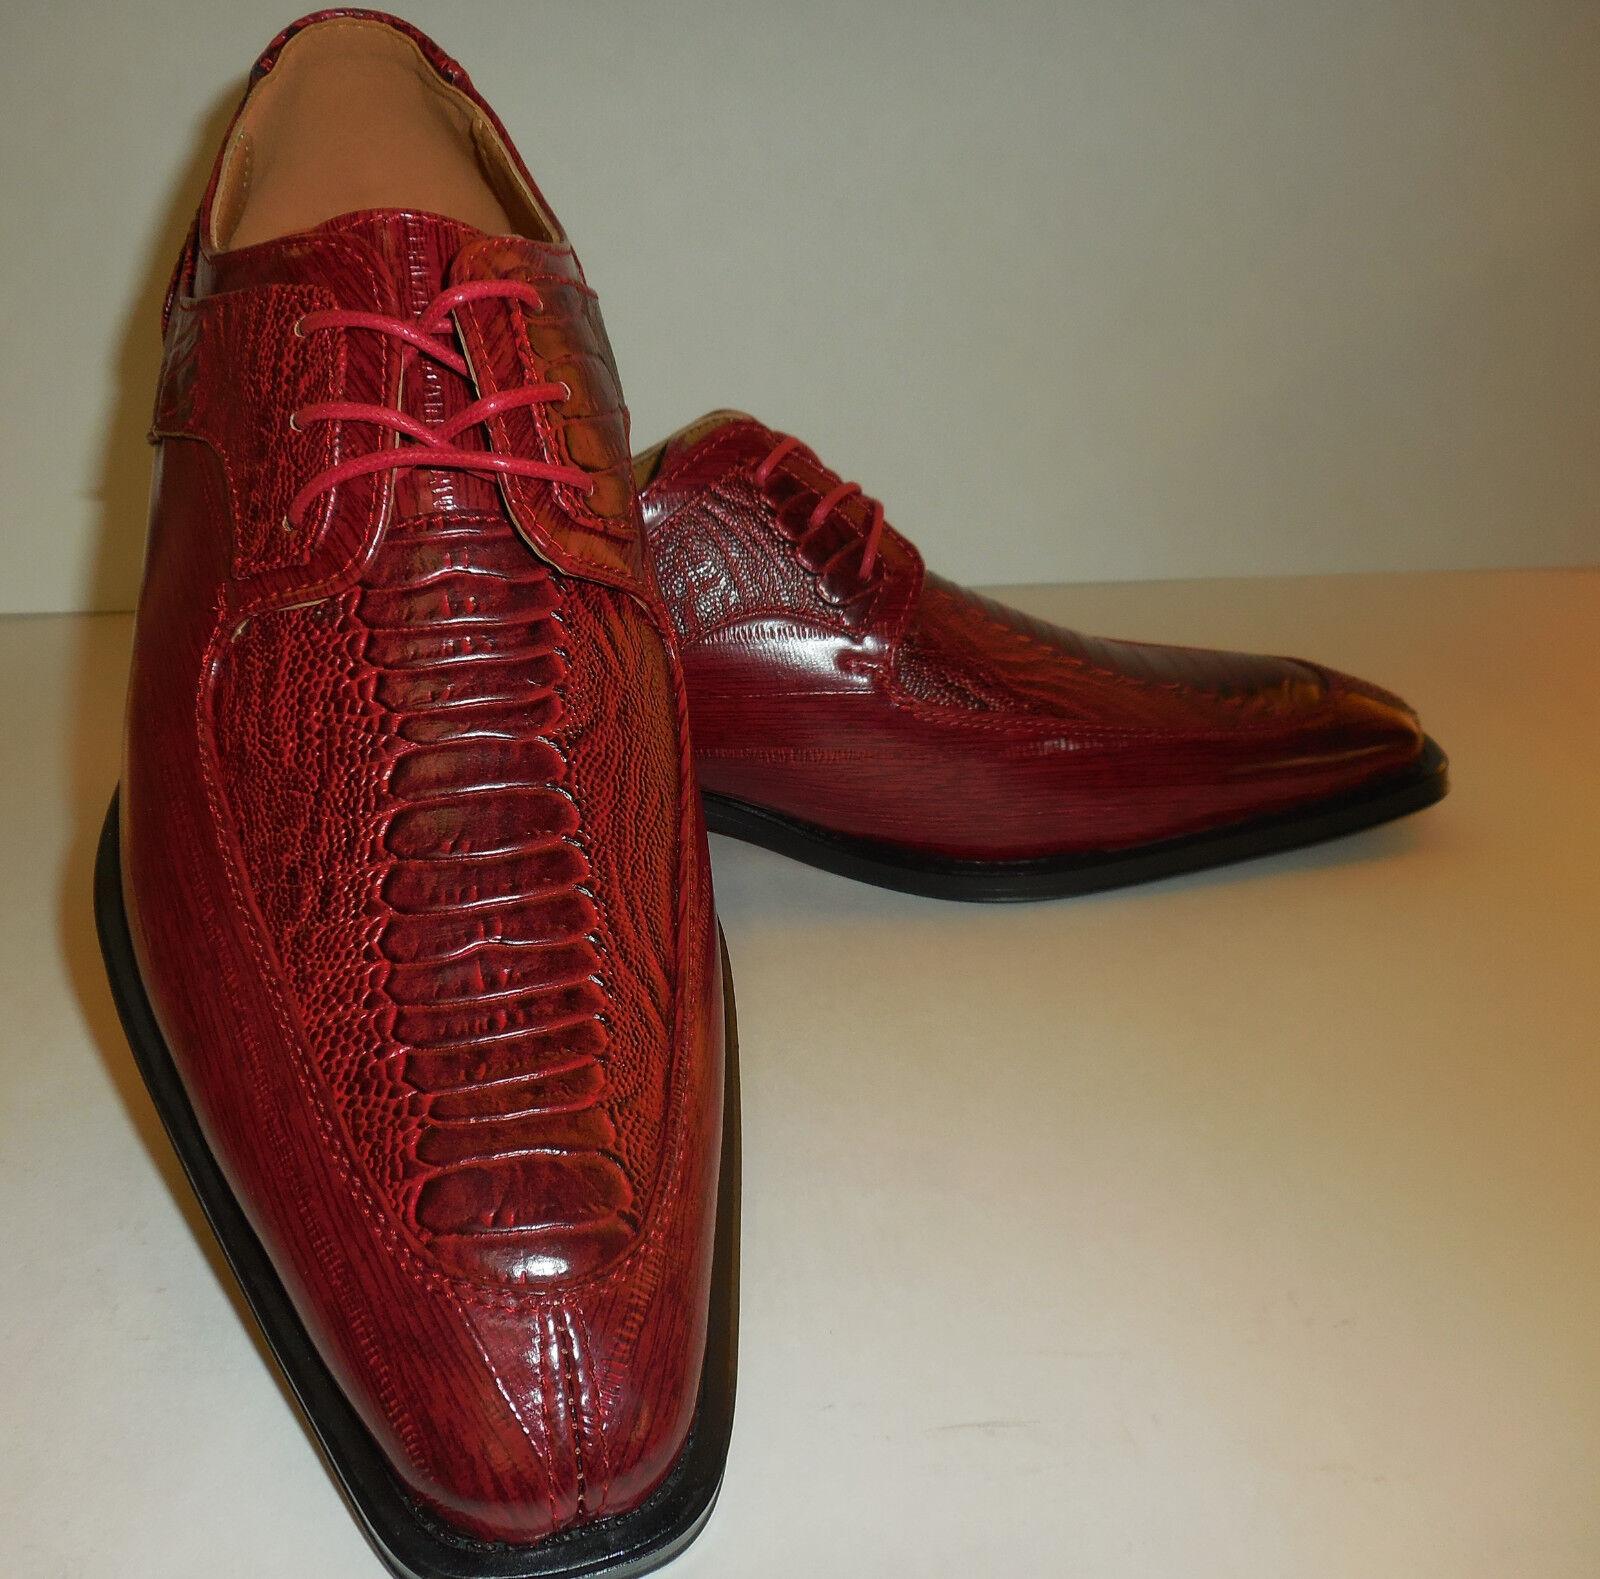 Uomo Elegant Modern Toe Dress Oxfords Scarpe Antonio Cerrelli 6536 Sangria Red